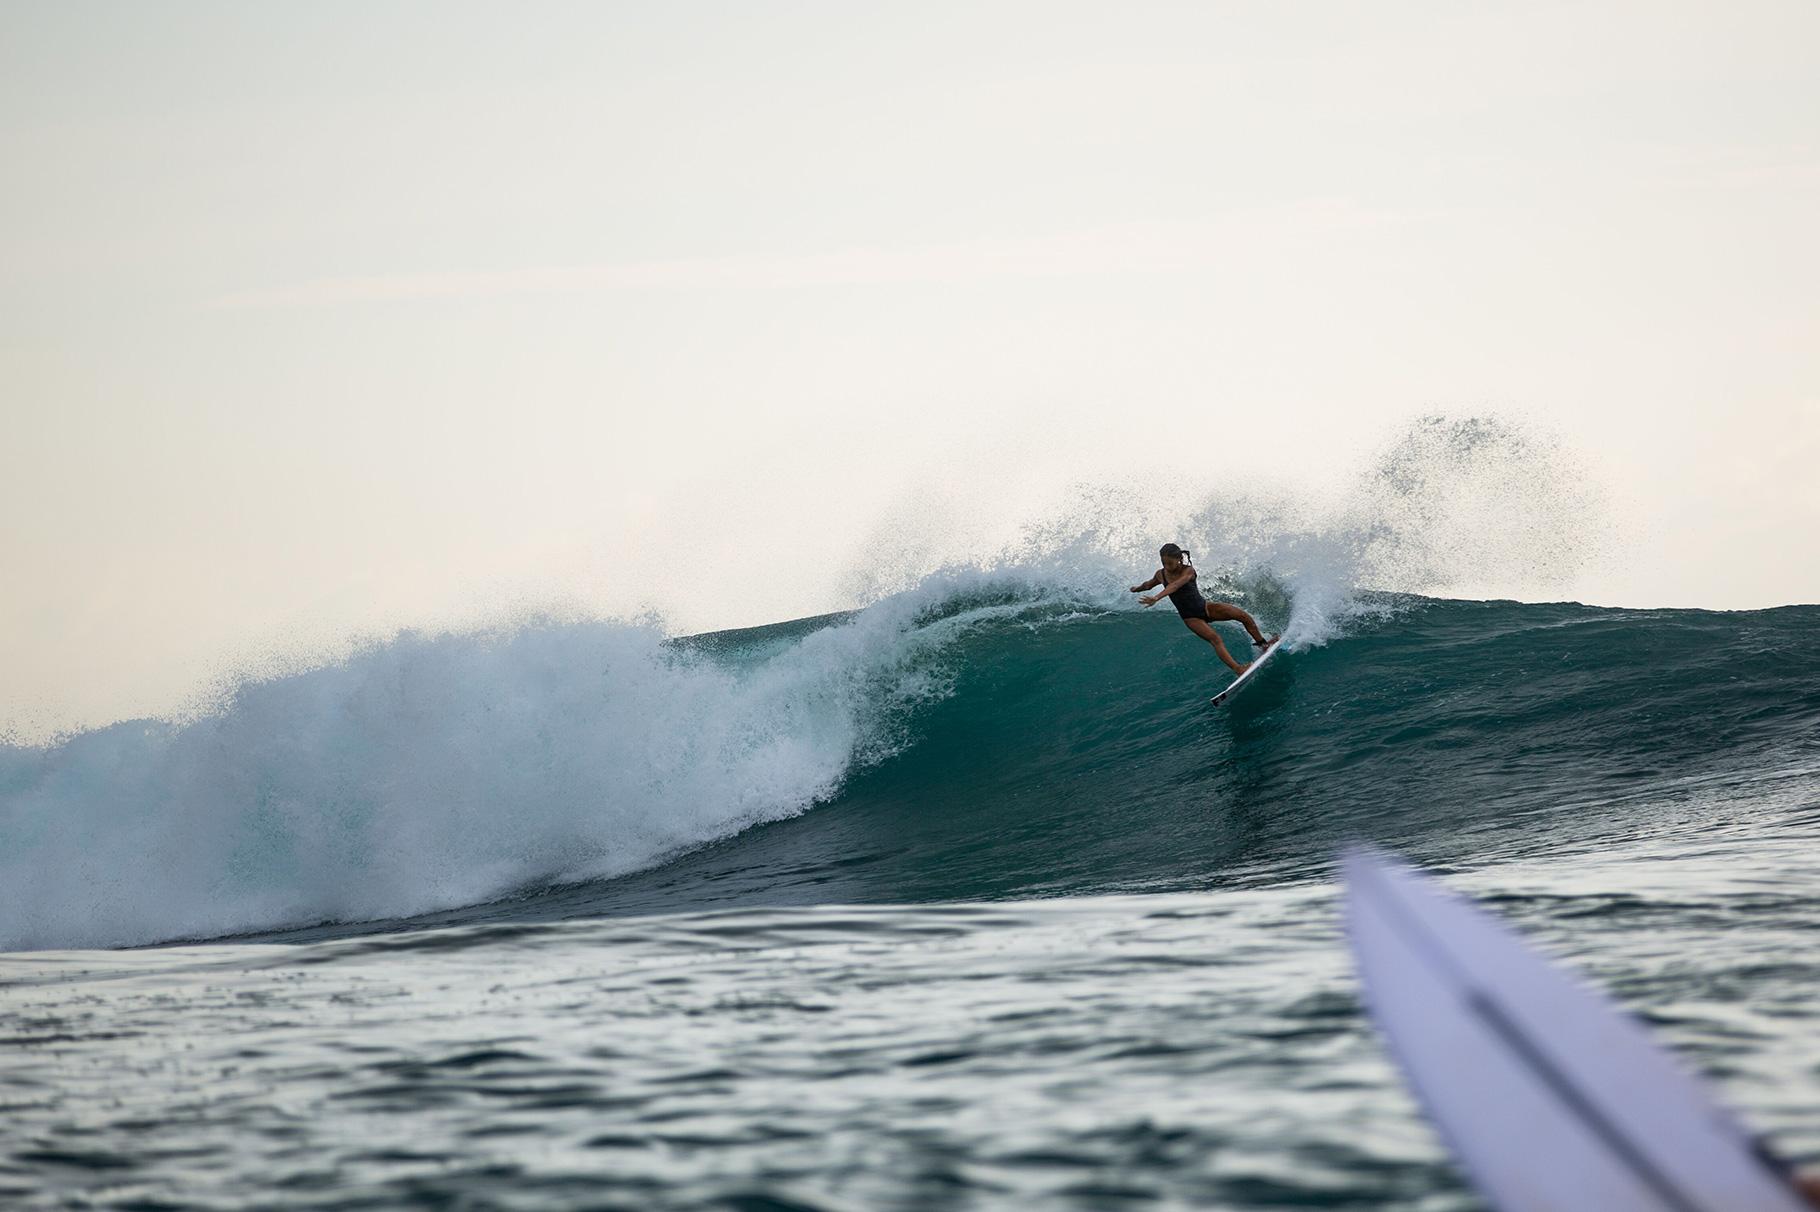 PM-Surfing-Lil-Cutback-1-1820.jpg